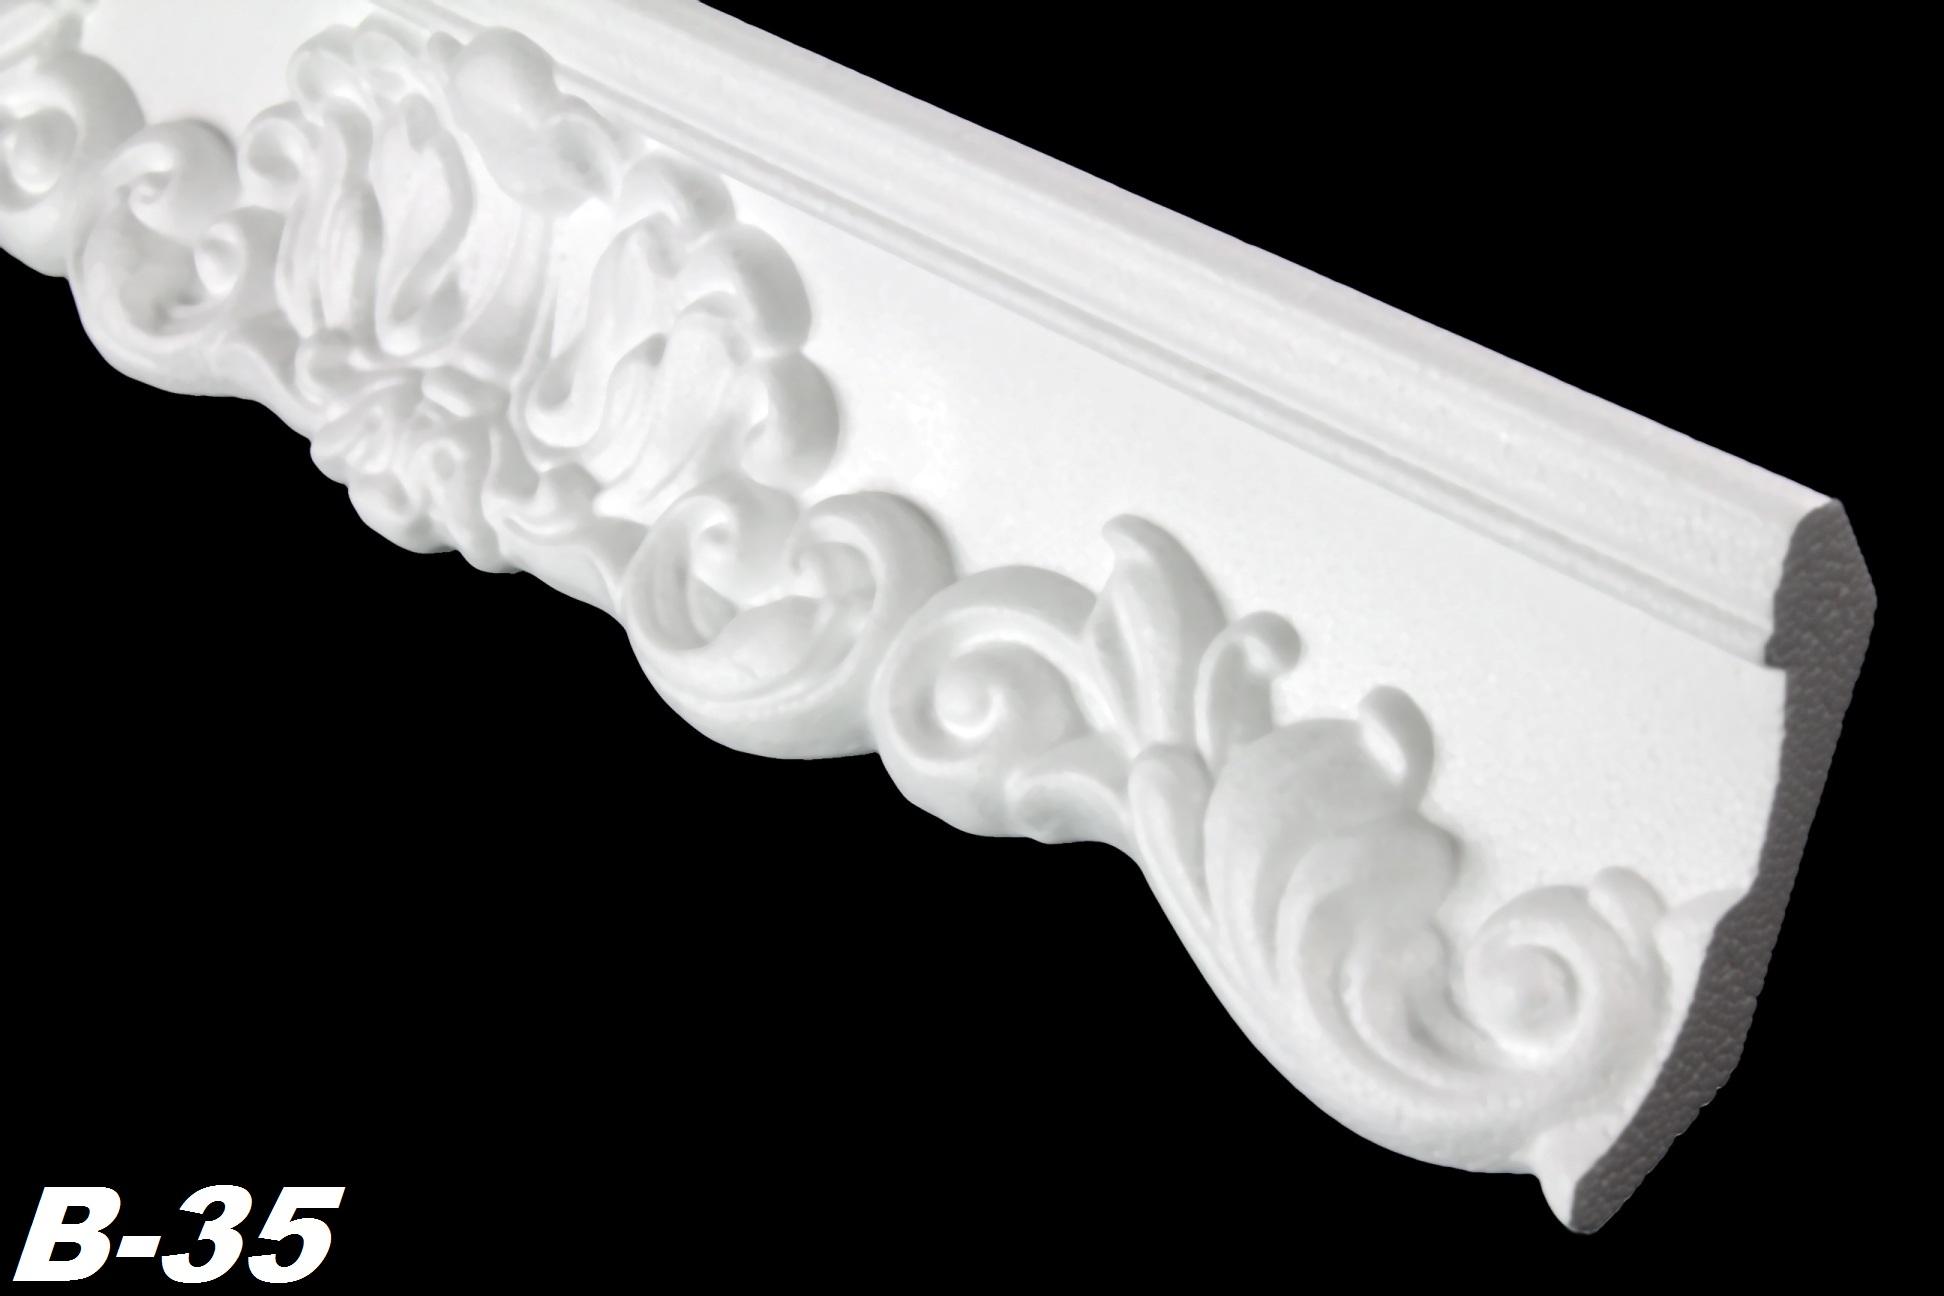 2 meter zierleiste innendekor dekorprofil stuck decke 52x63mm b 35 ebay. Black Bedroom Furniture Sets. Home Design Ideas